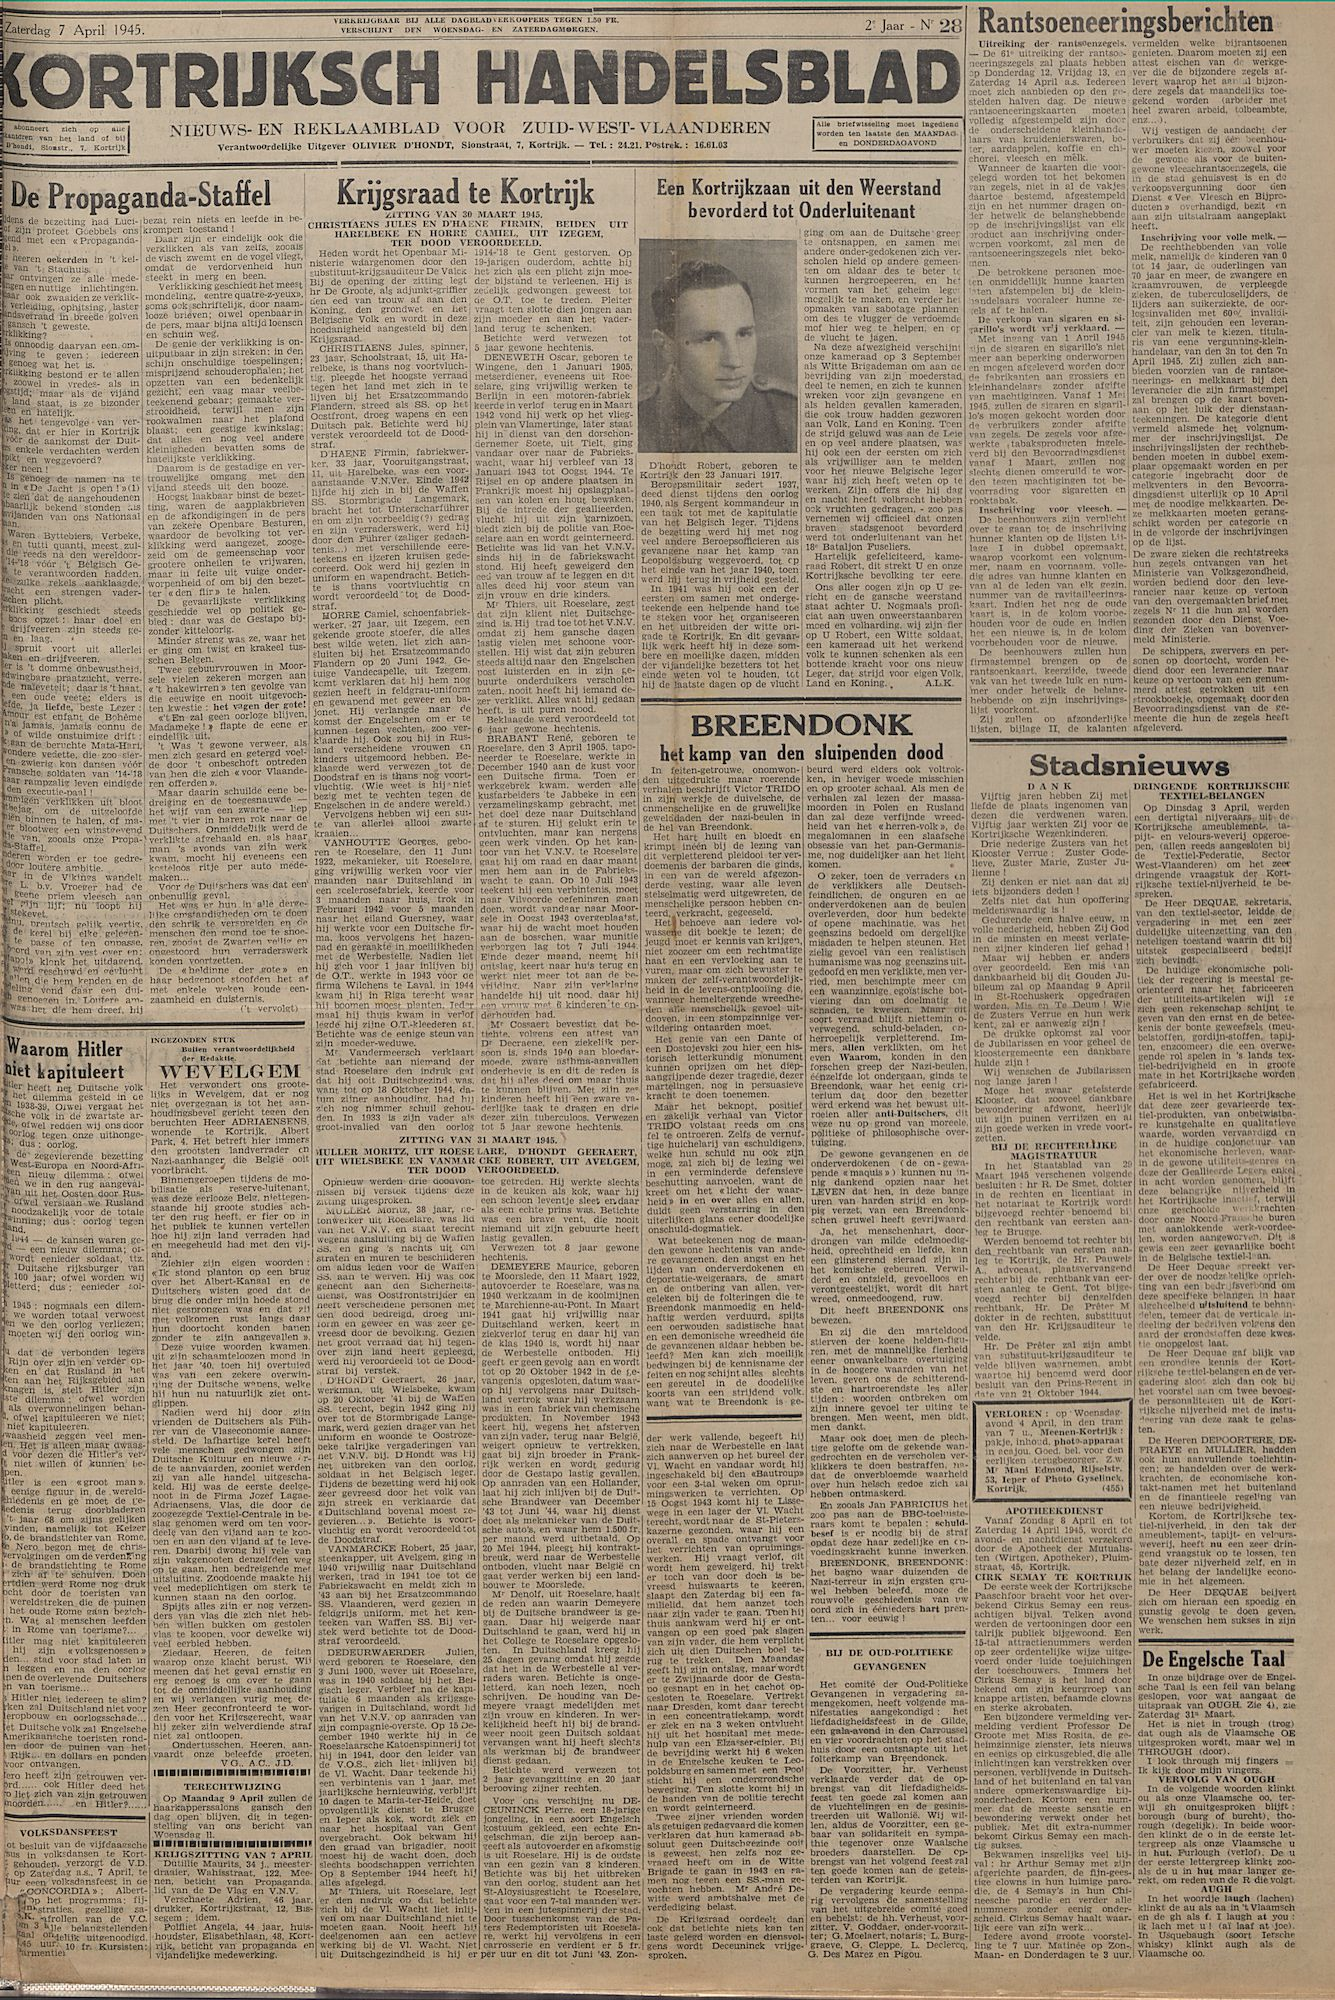 Kortrijksch Handelsblad 7 april 1945 Nr28 p1